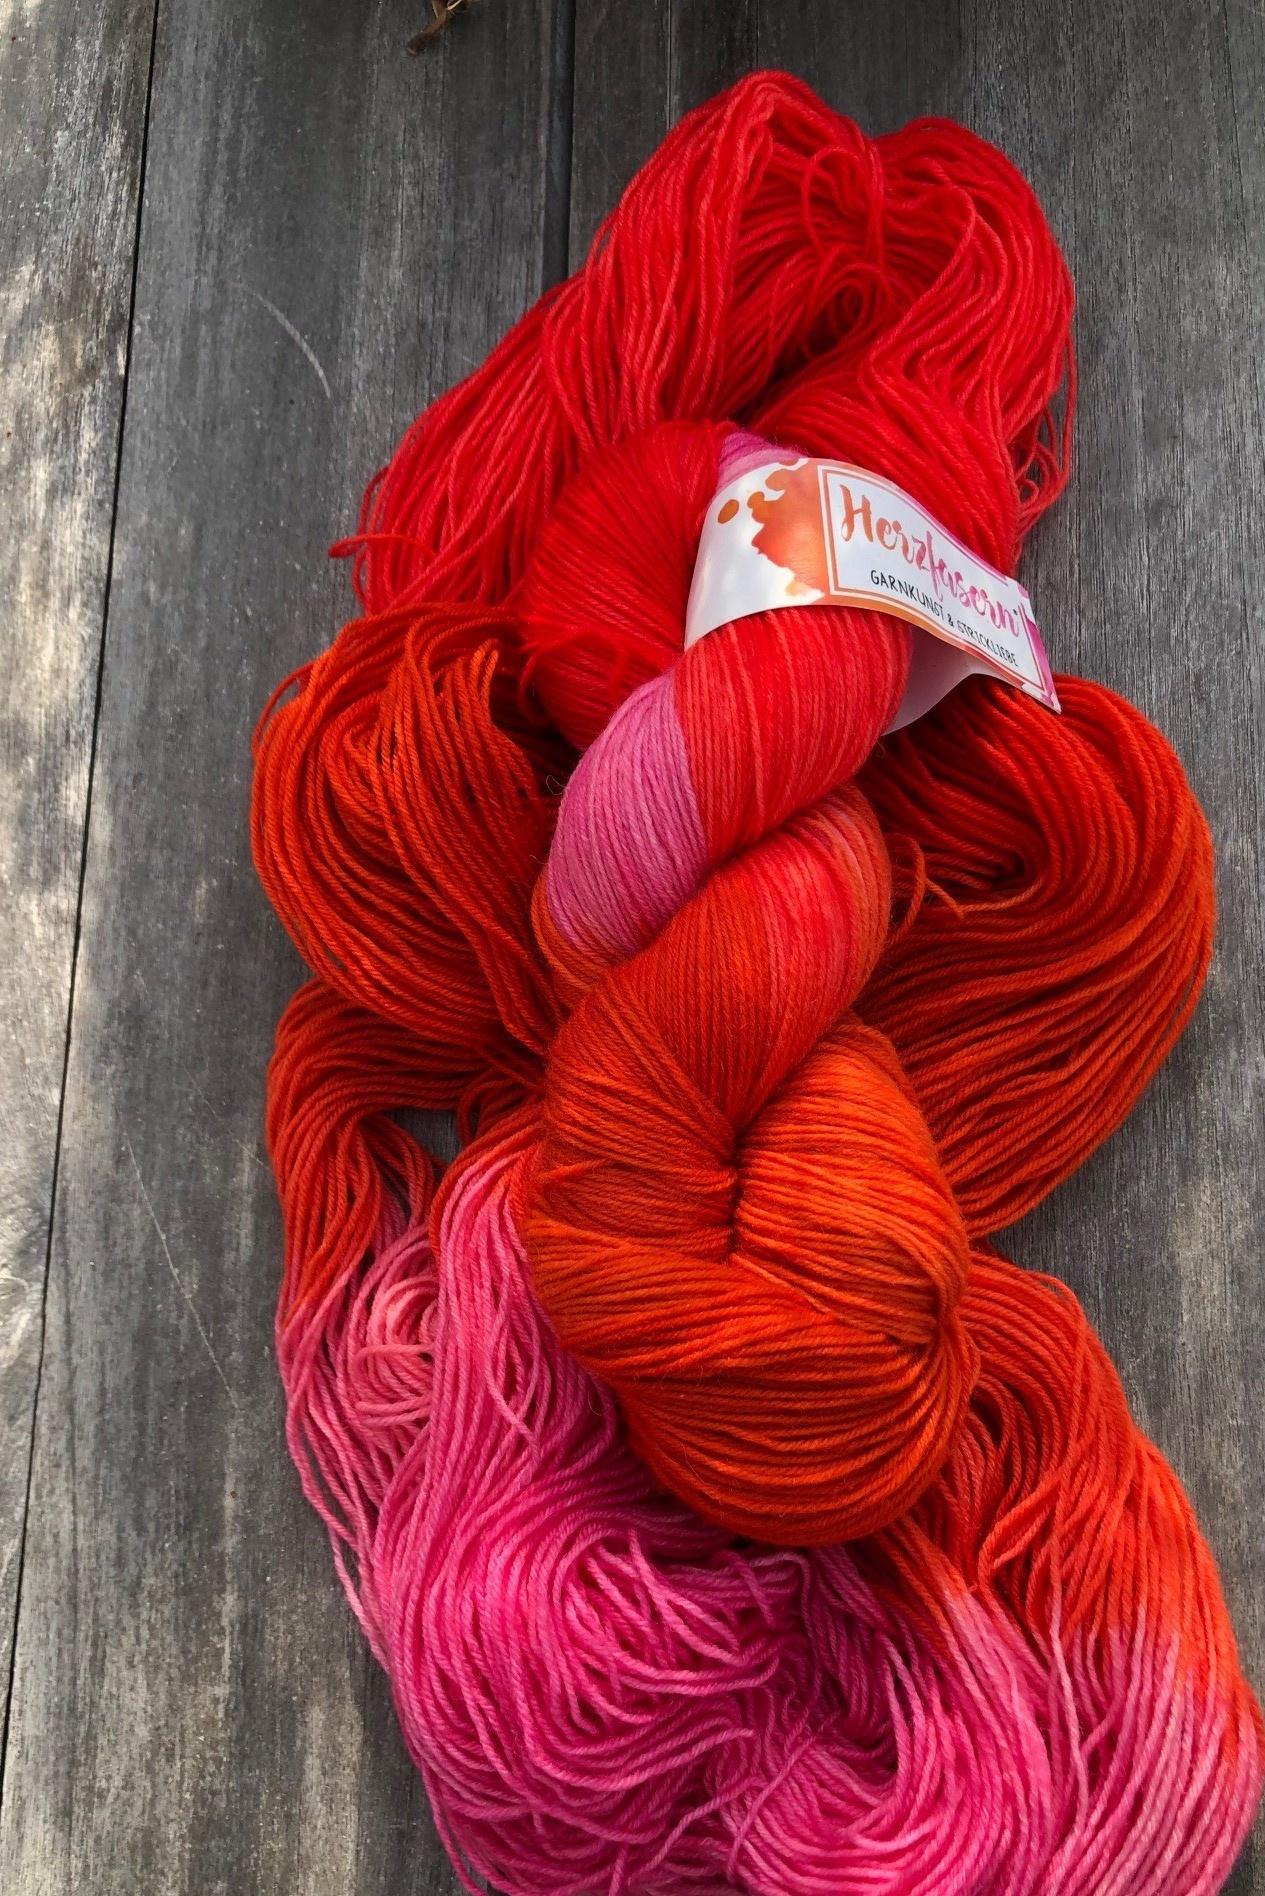 Herzfasern Sockenwolle - Rosa Orange